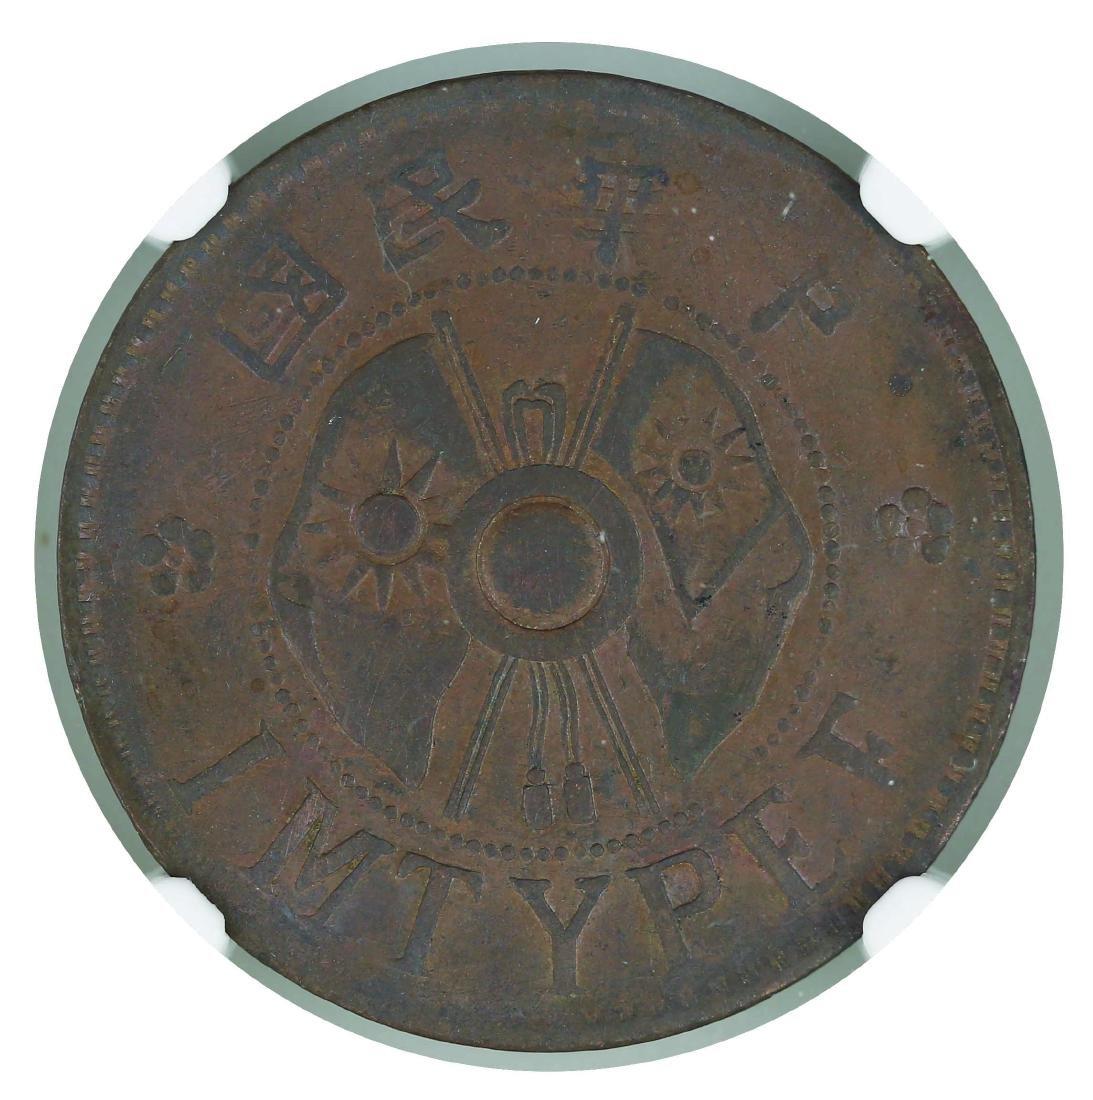 China-Shensi Province, 1928, 2 Cents - 2